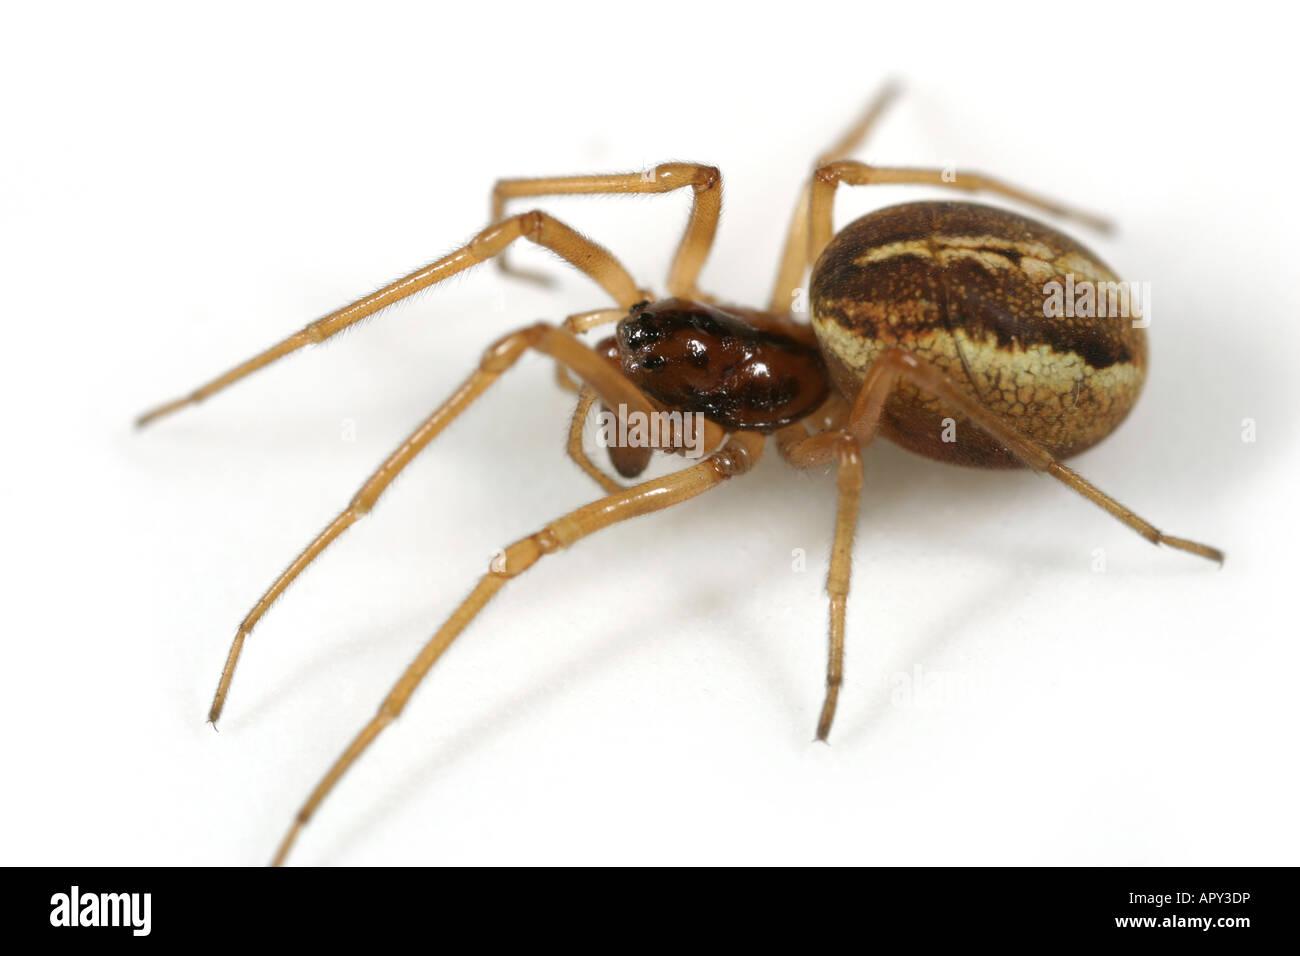 Female Pachyghatha clercki spider, Tetragnathidae family, on white background. - Stock Image